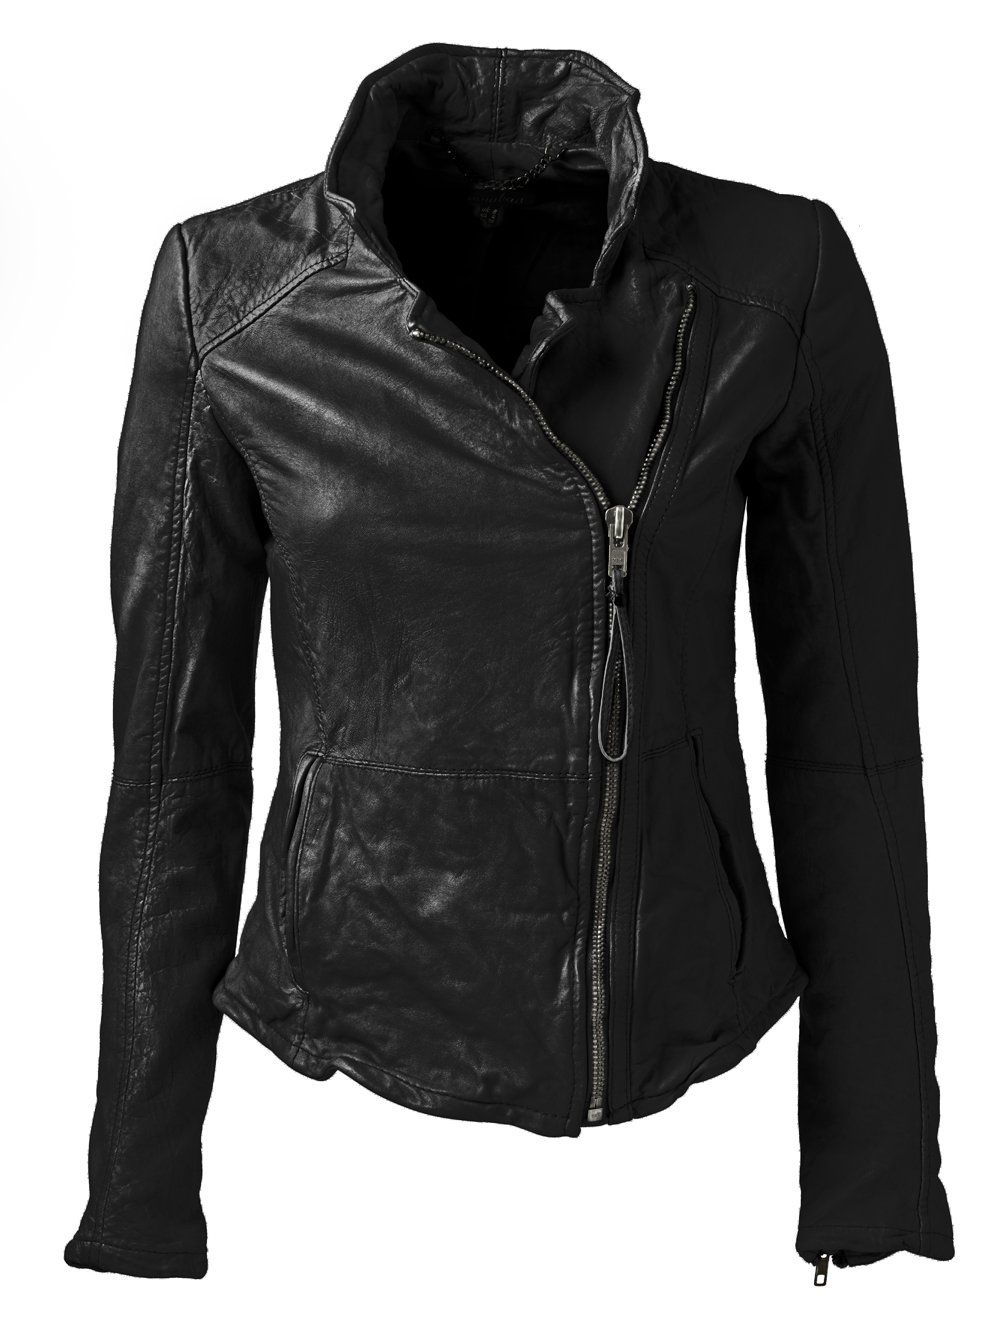 e036455c713e Kendyll Leather Biker Jacket in Black | Jacket love! | Muubaa ...